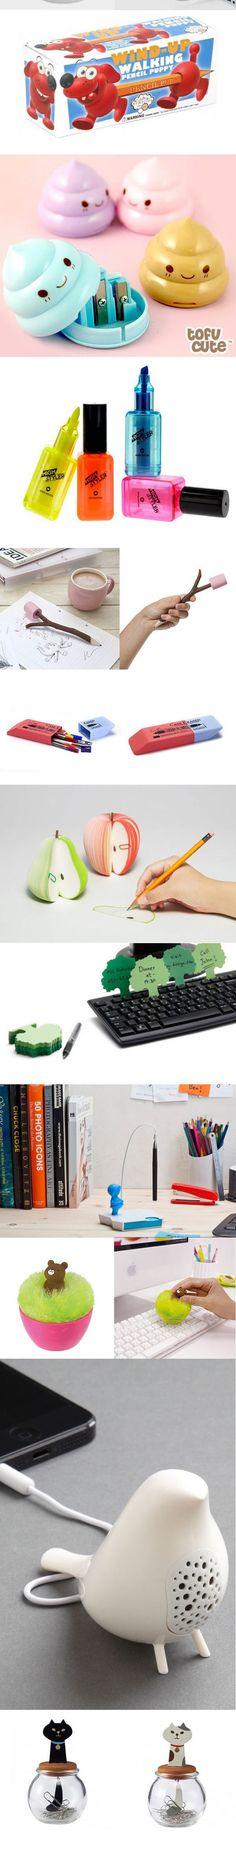 I Love Cute Desk Things